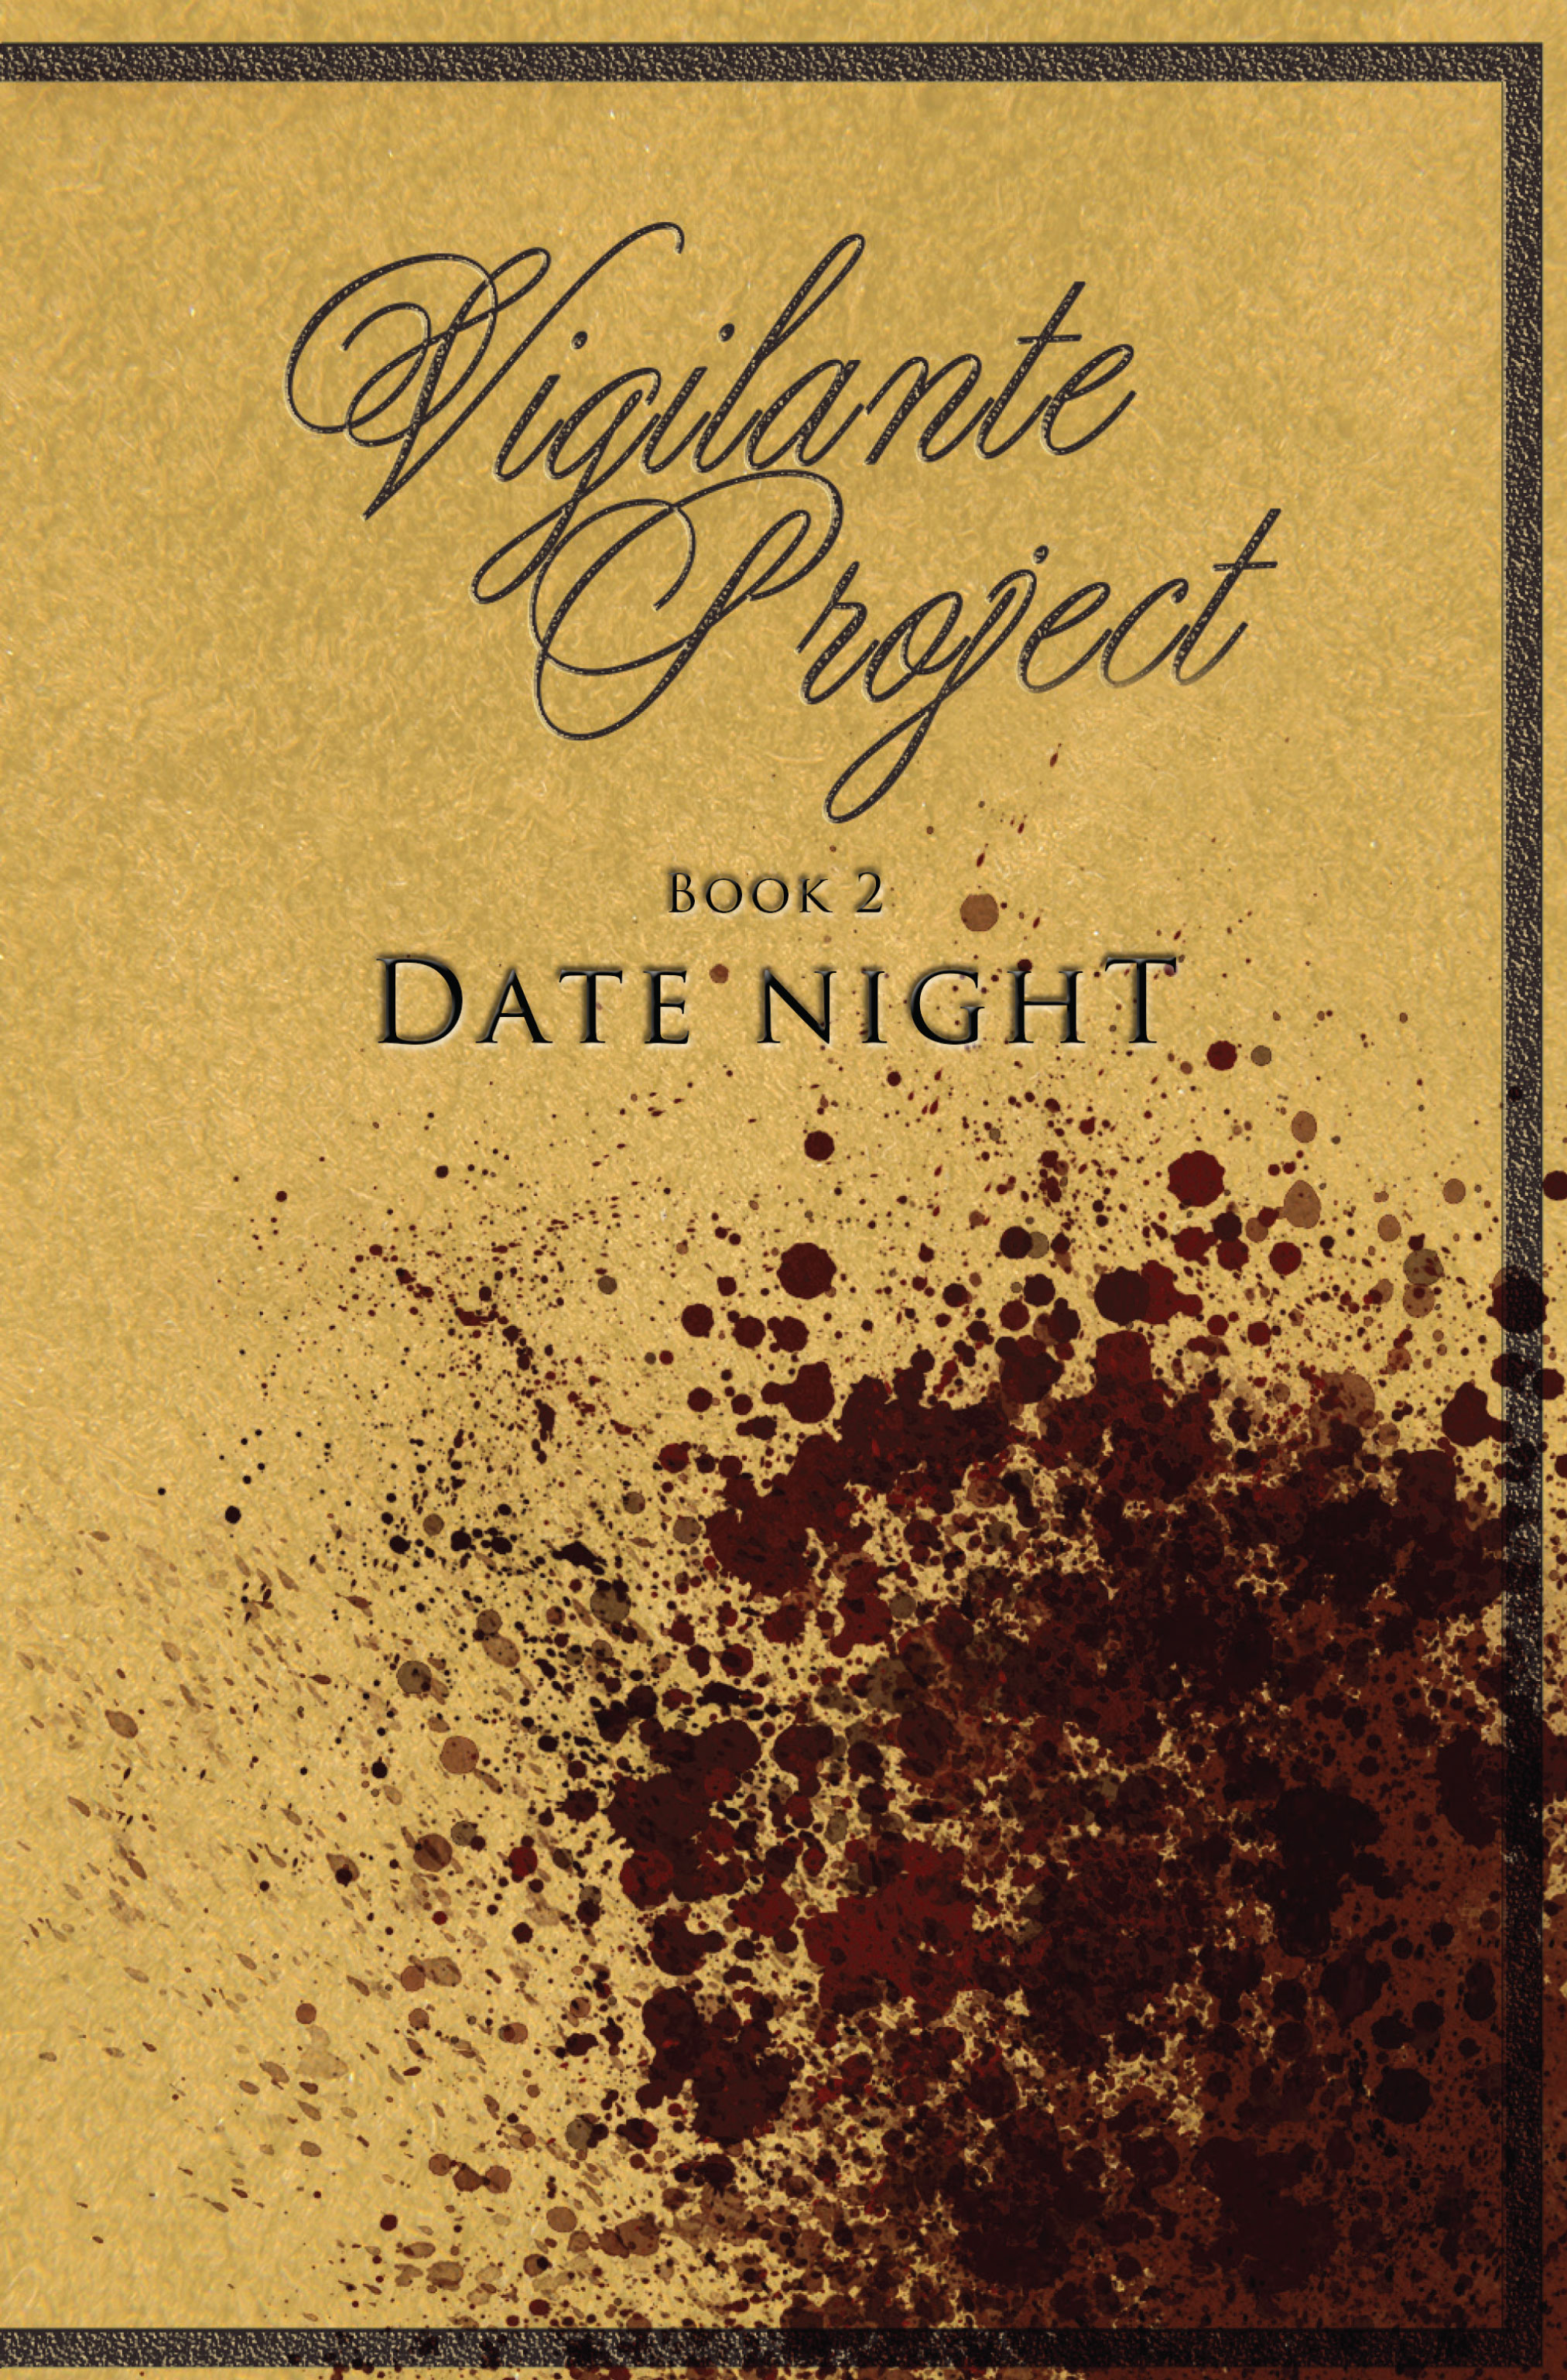 Date night online free